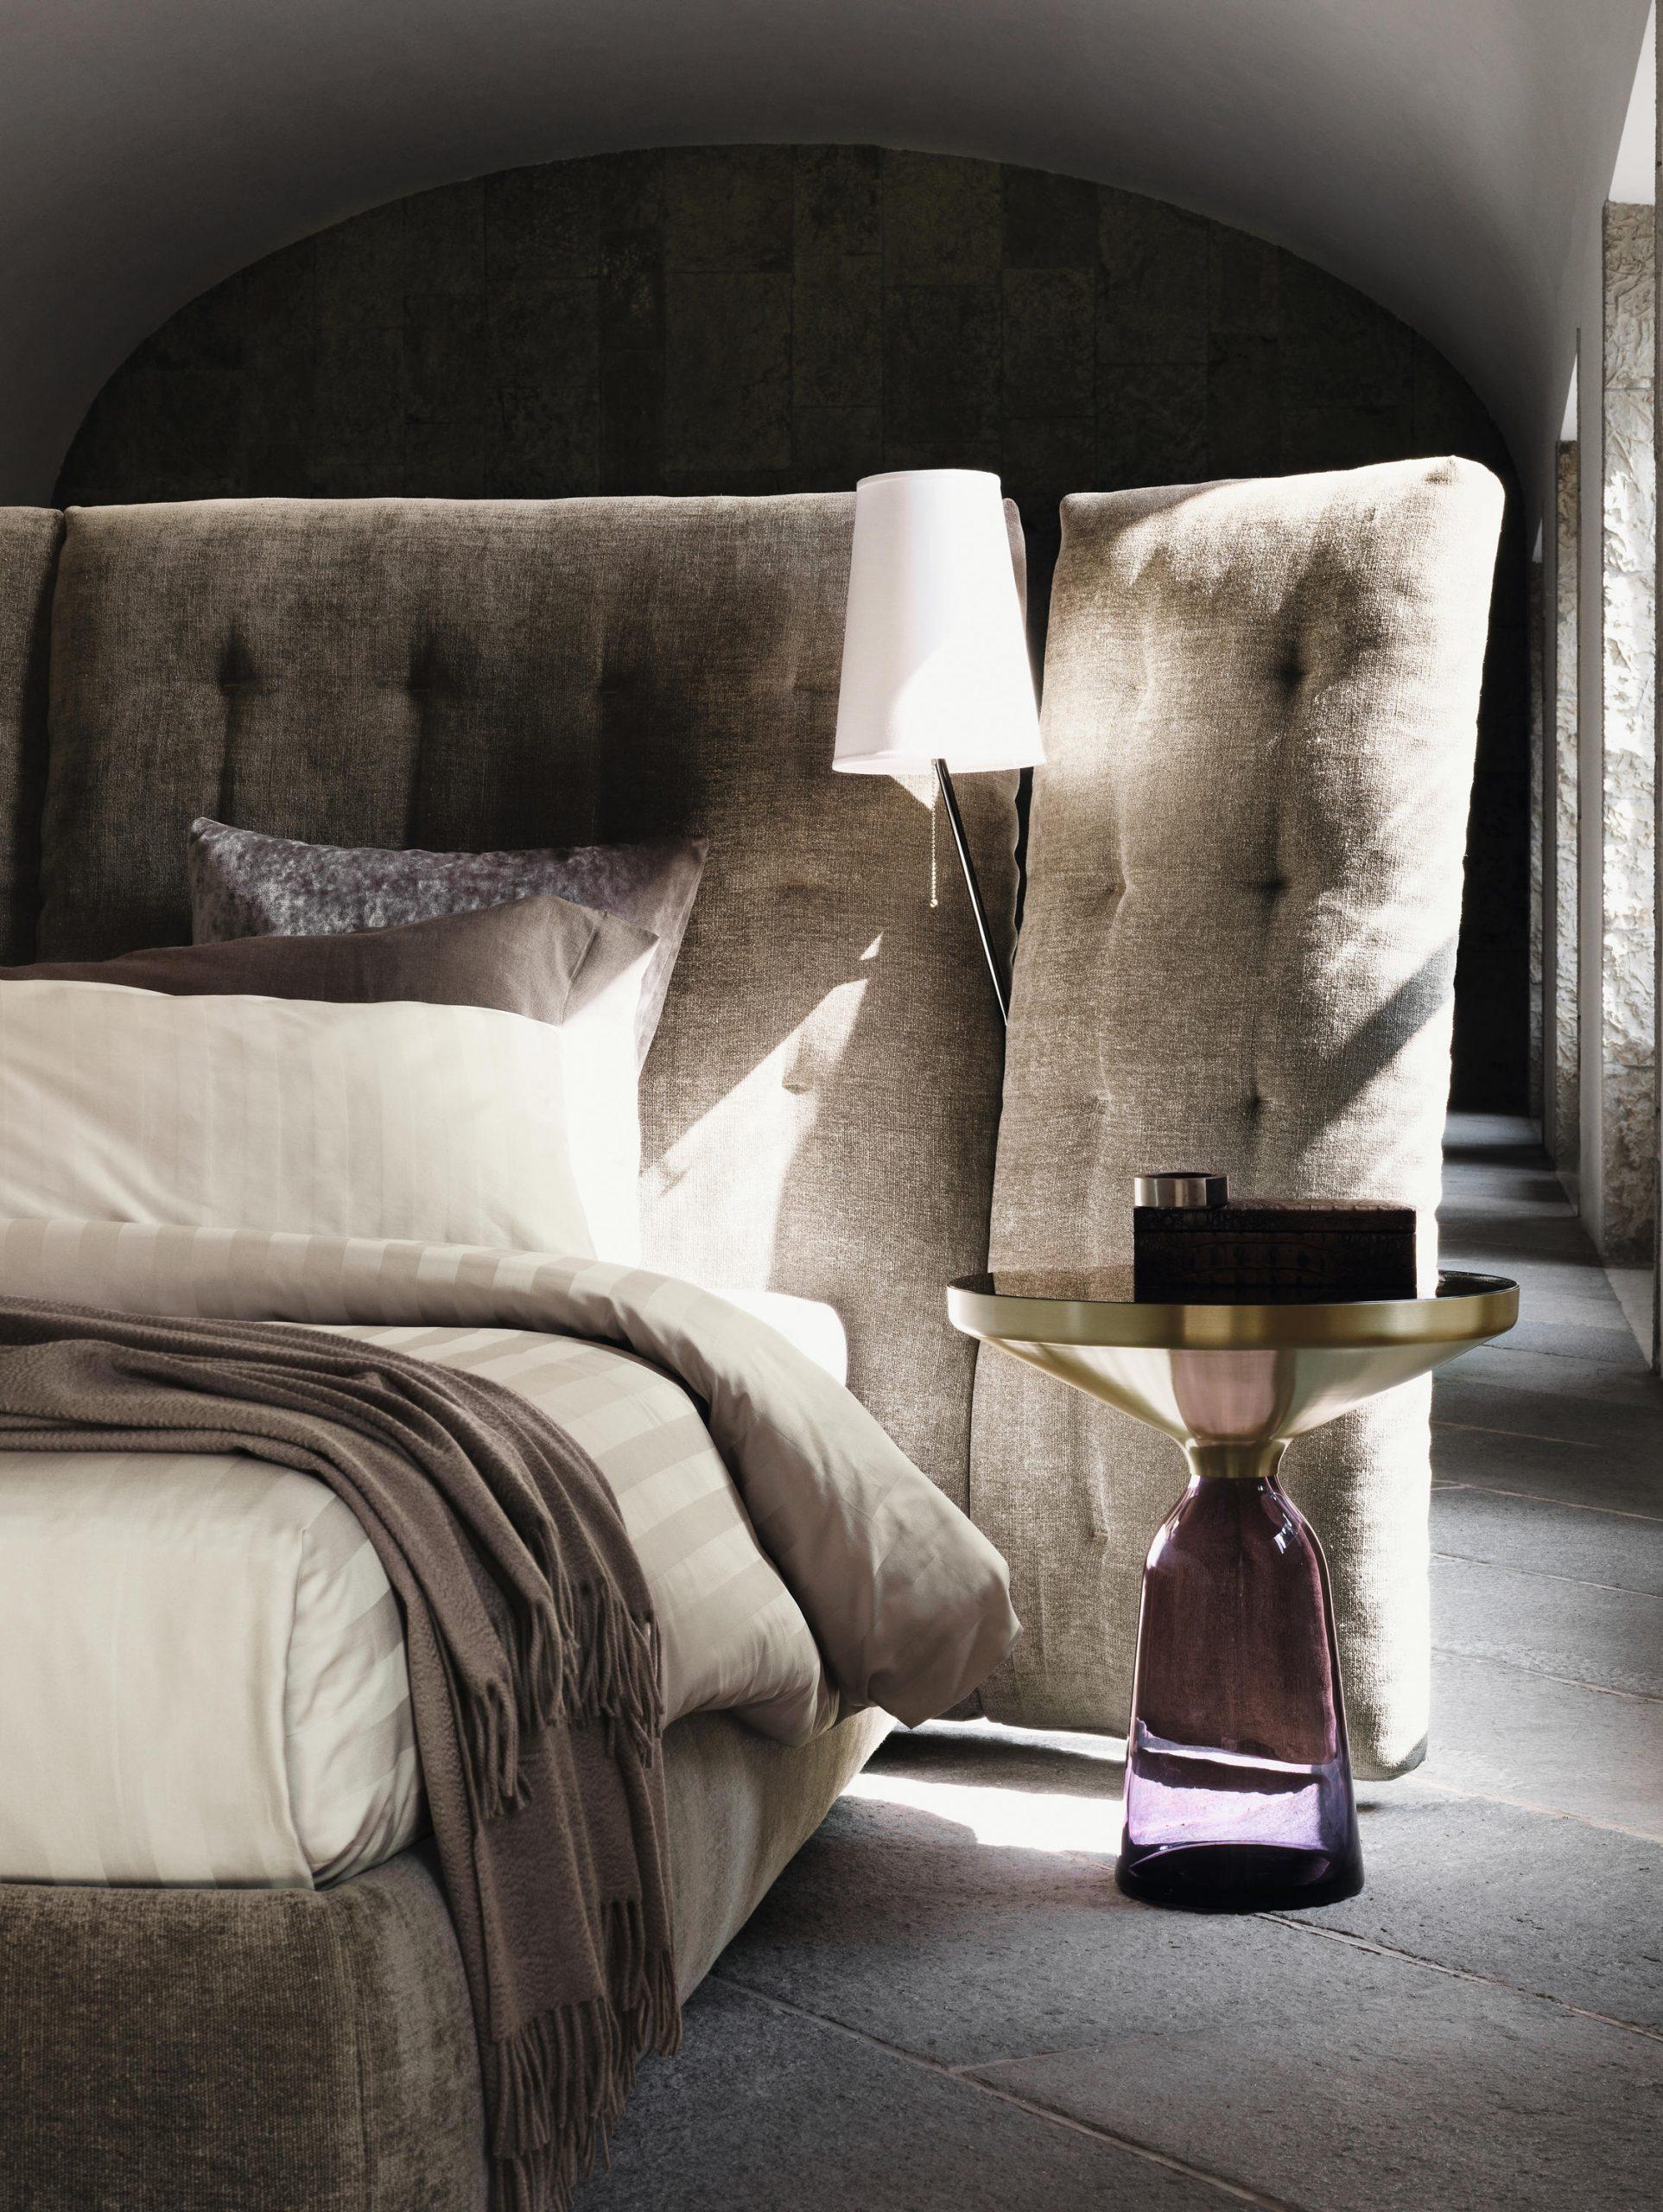 Full Size of Bett Mit Hohem Kopfteil Angle Gestepptes Architonic Metall Sofa Boxen Rauch Betten 140 X 200 Minimalistisch Stauraum 160x200 Schlafzimmer überbau 140x220 Bett Bett Mit Hohem Kopfteil